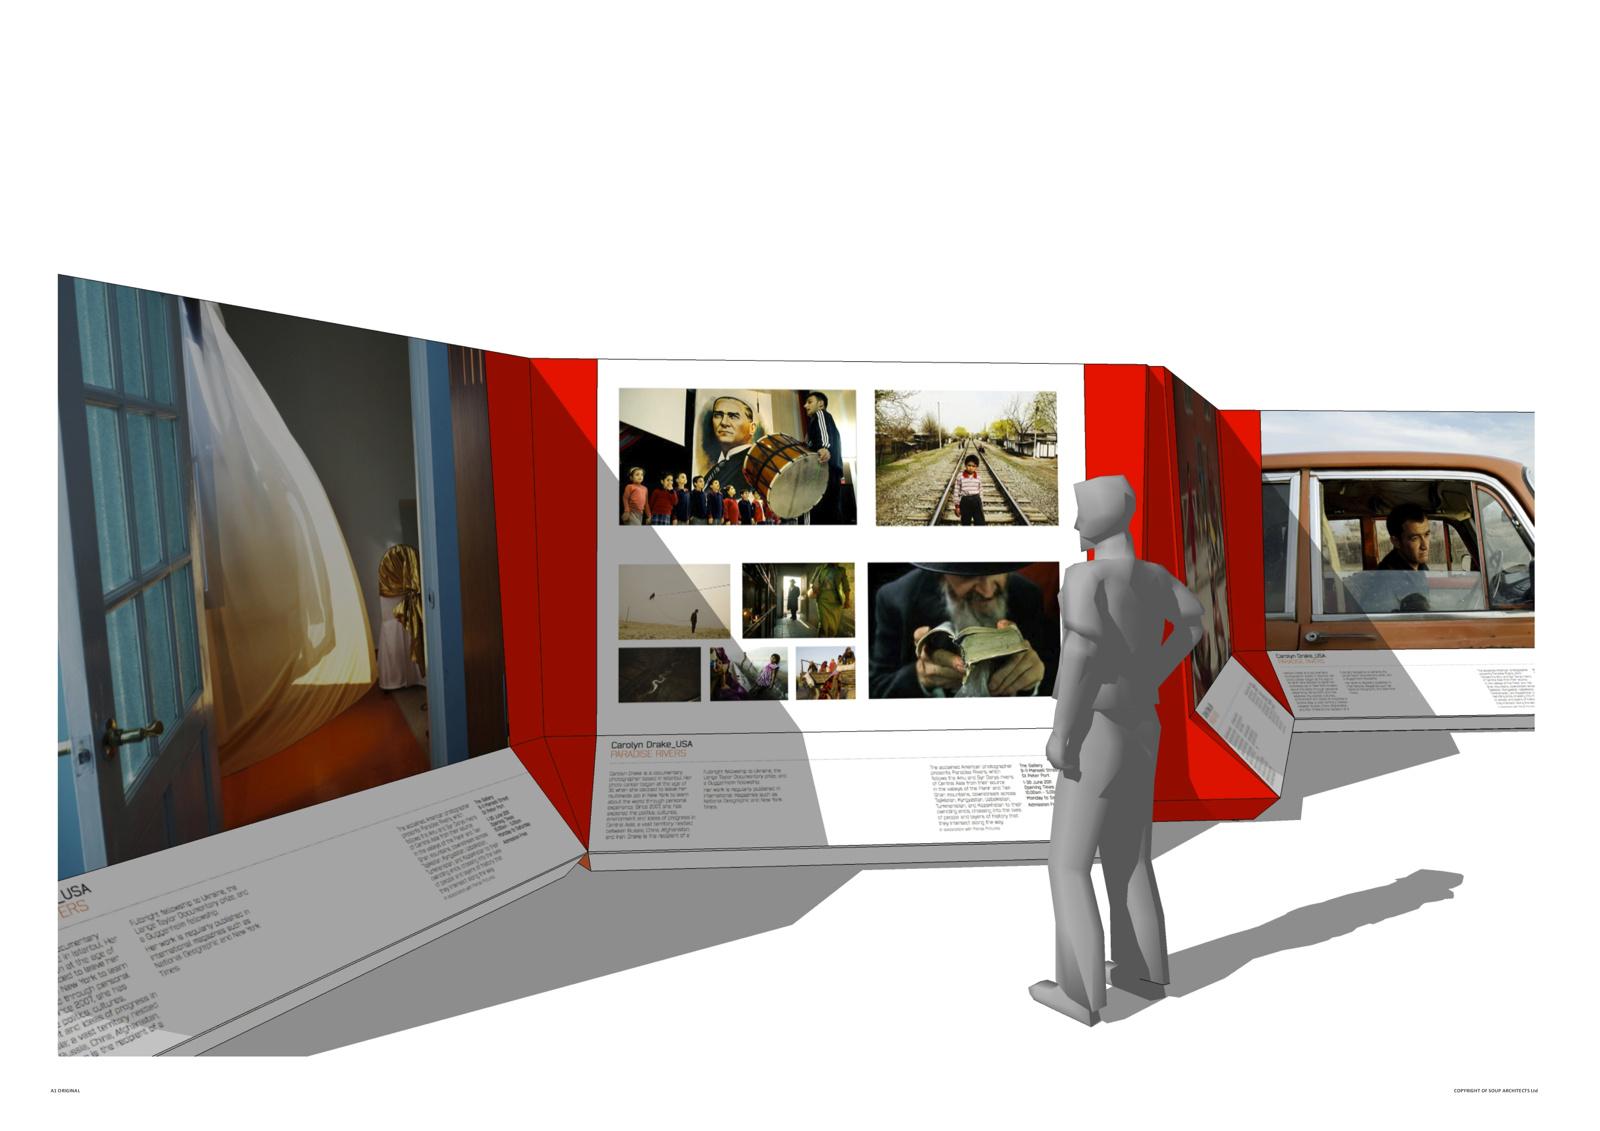 5166d54ae4d70ebf-GPF_ExhibitionBoard_WorkingDrawings06.jpg